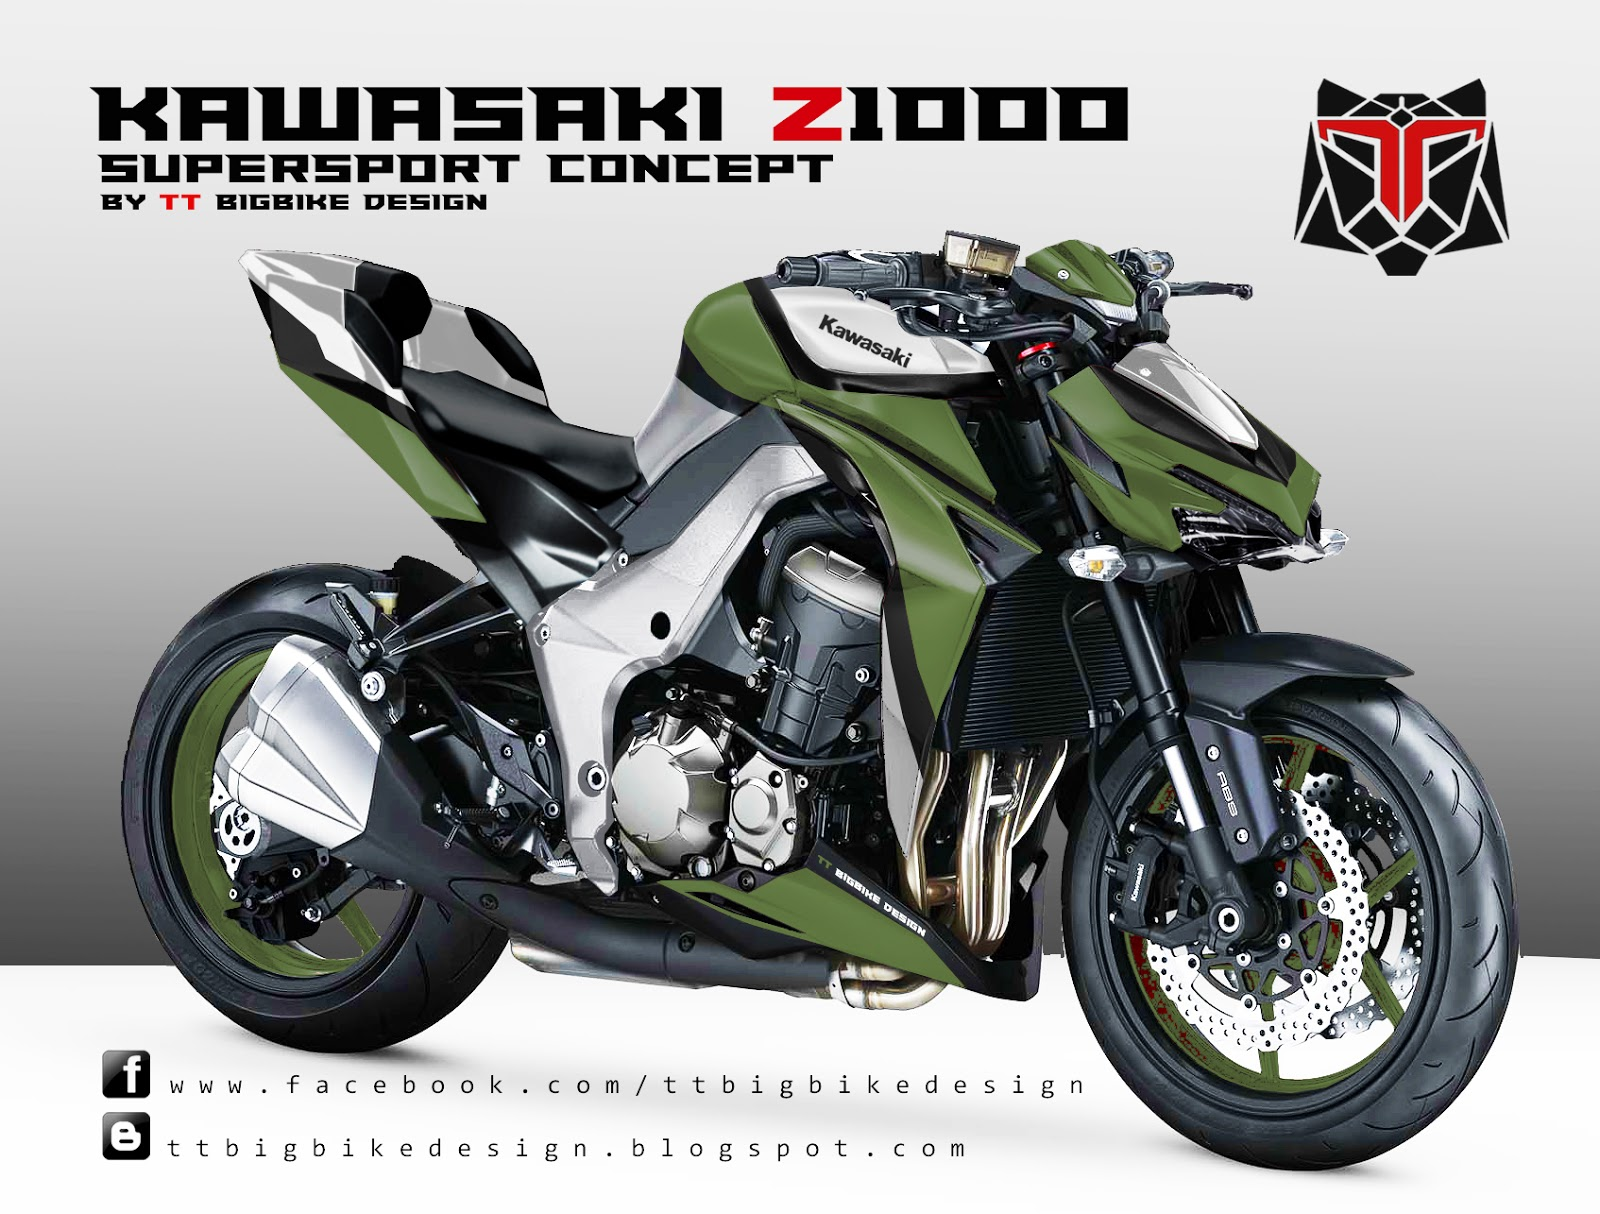 Kawasaki Supersport